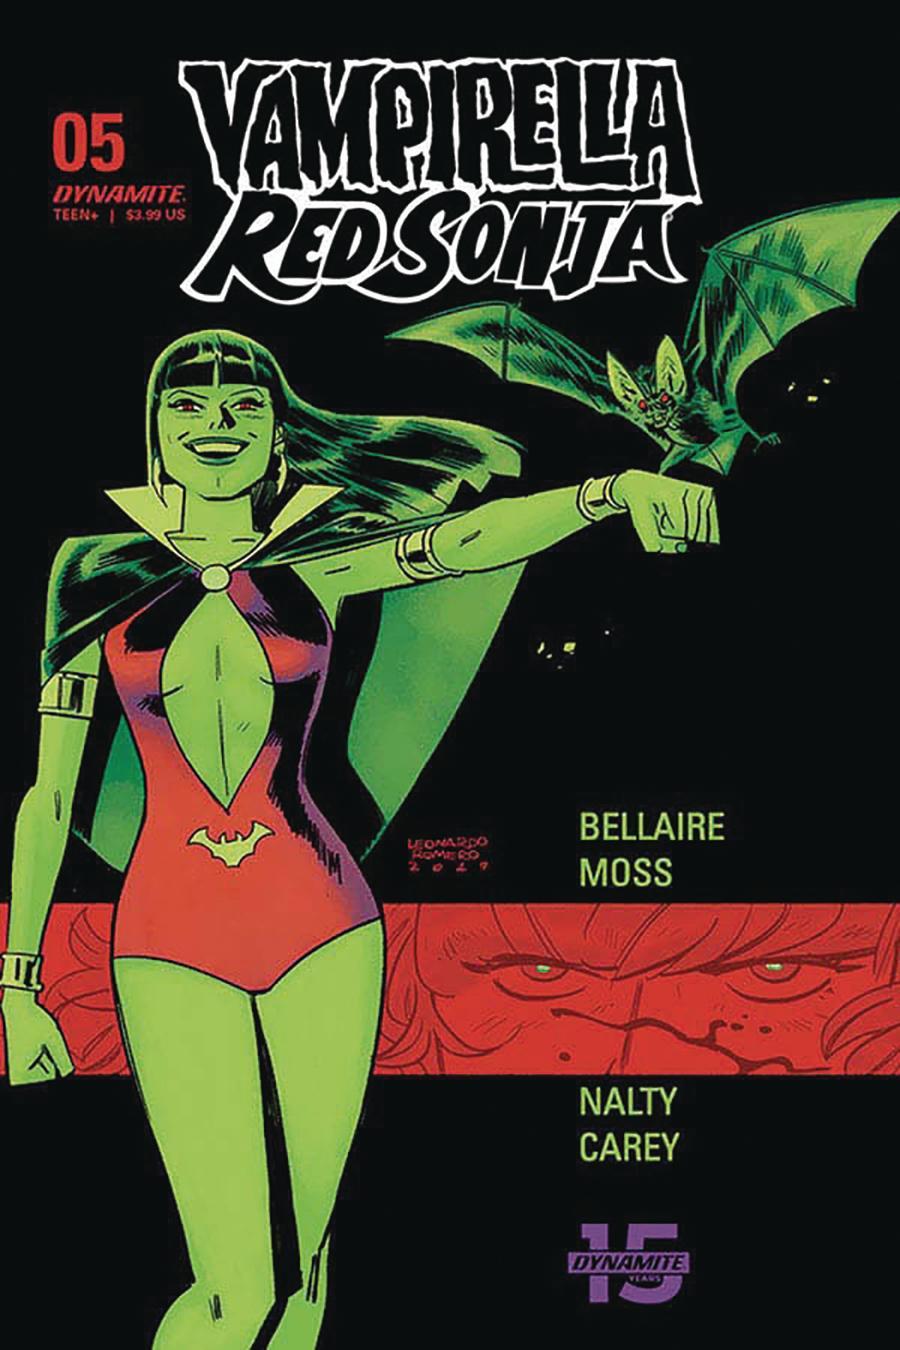 Vampirella Red Sonja #5 Cover D Variant Leonardo Romero & Jordie Bellaire Cover